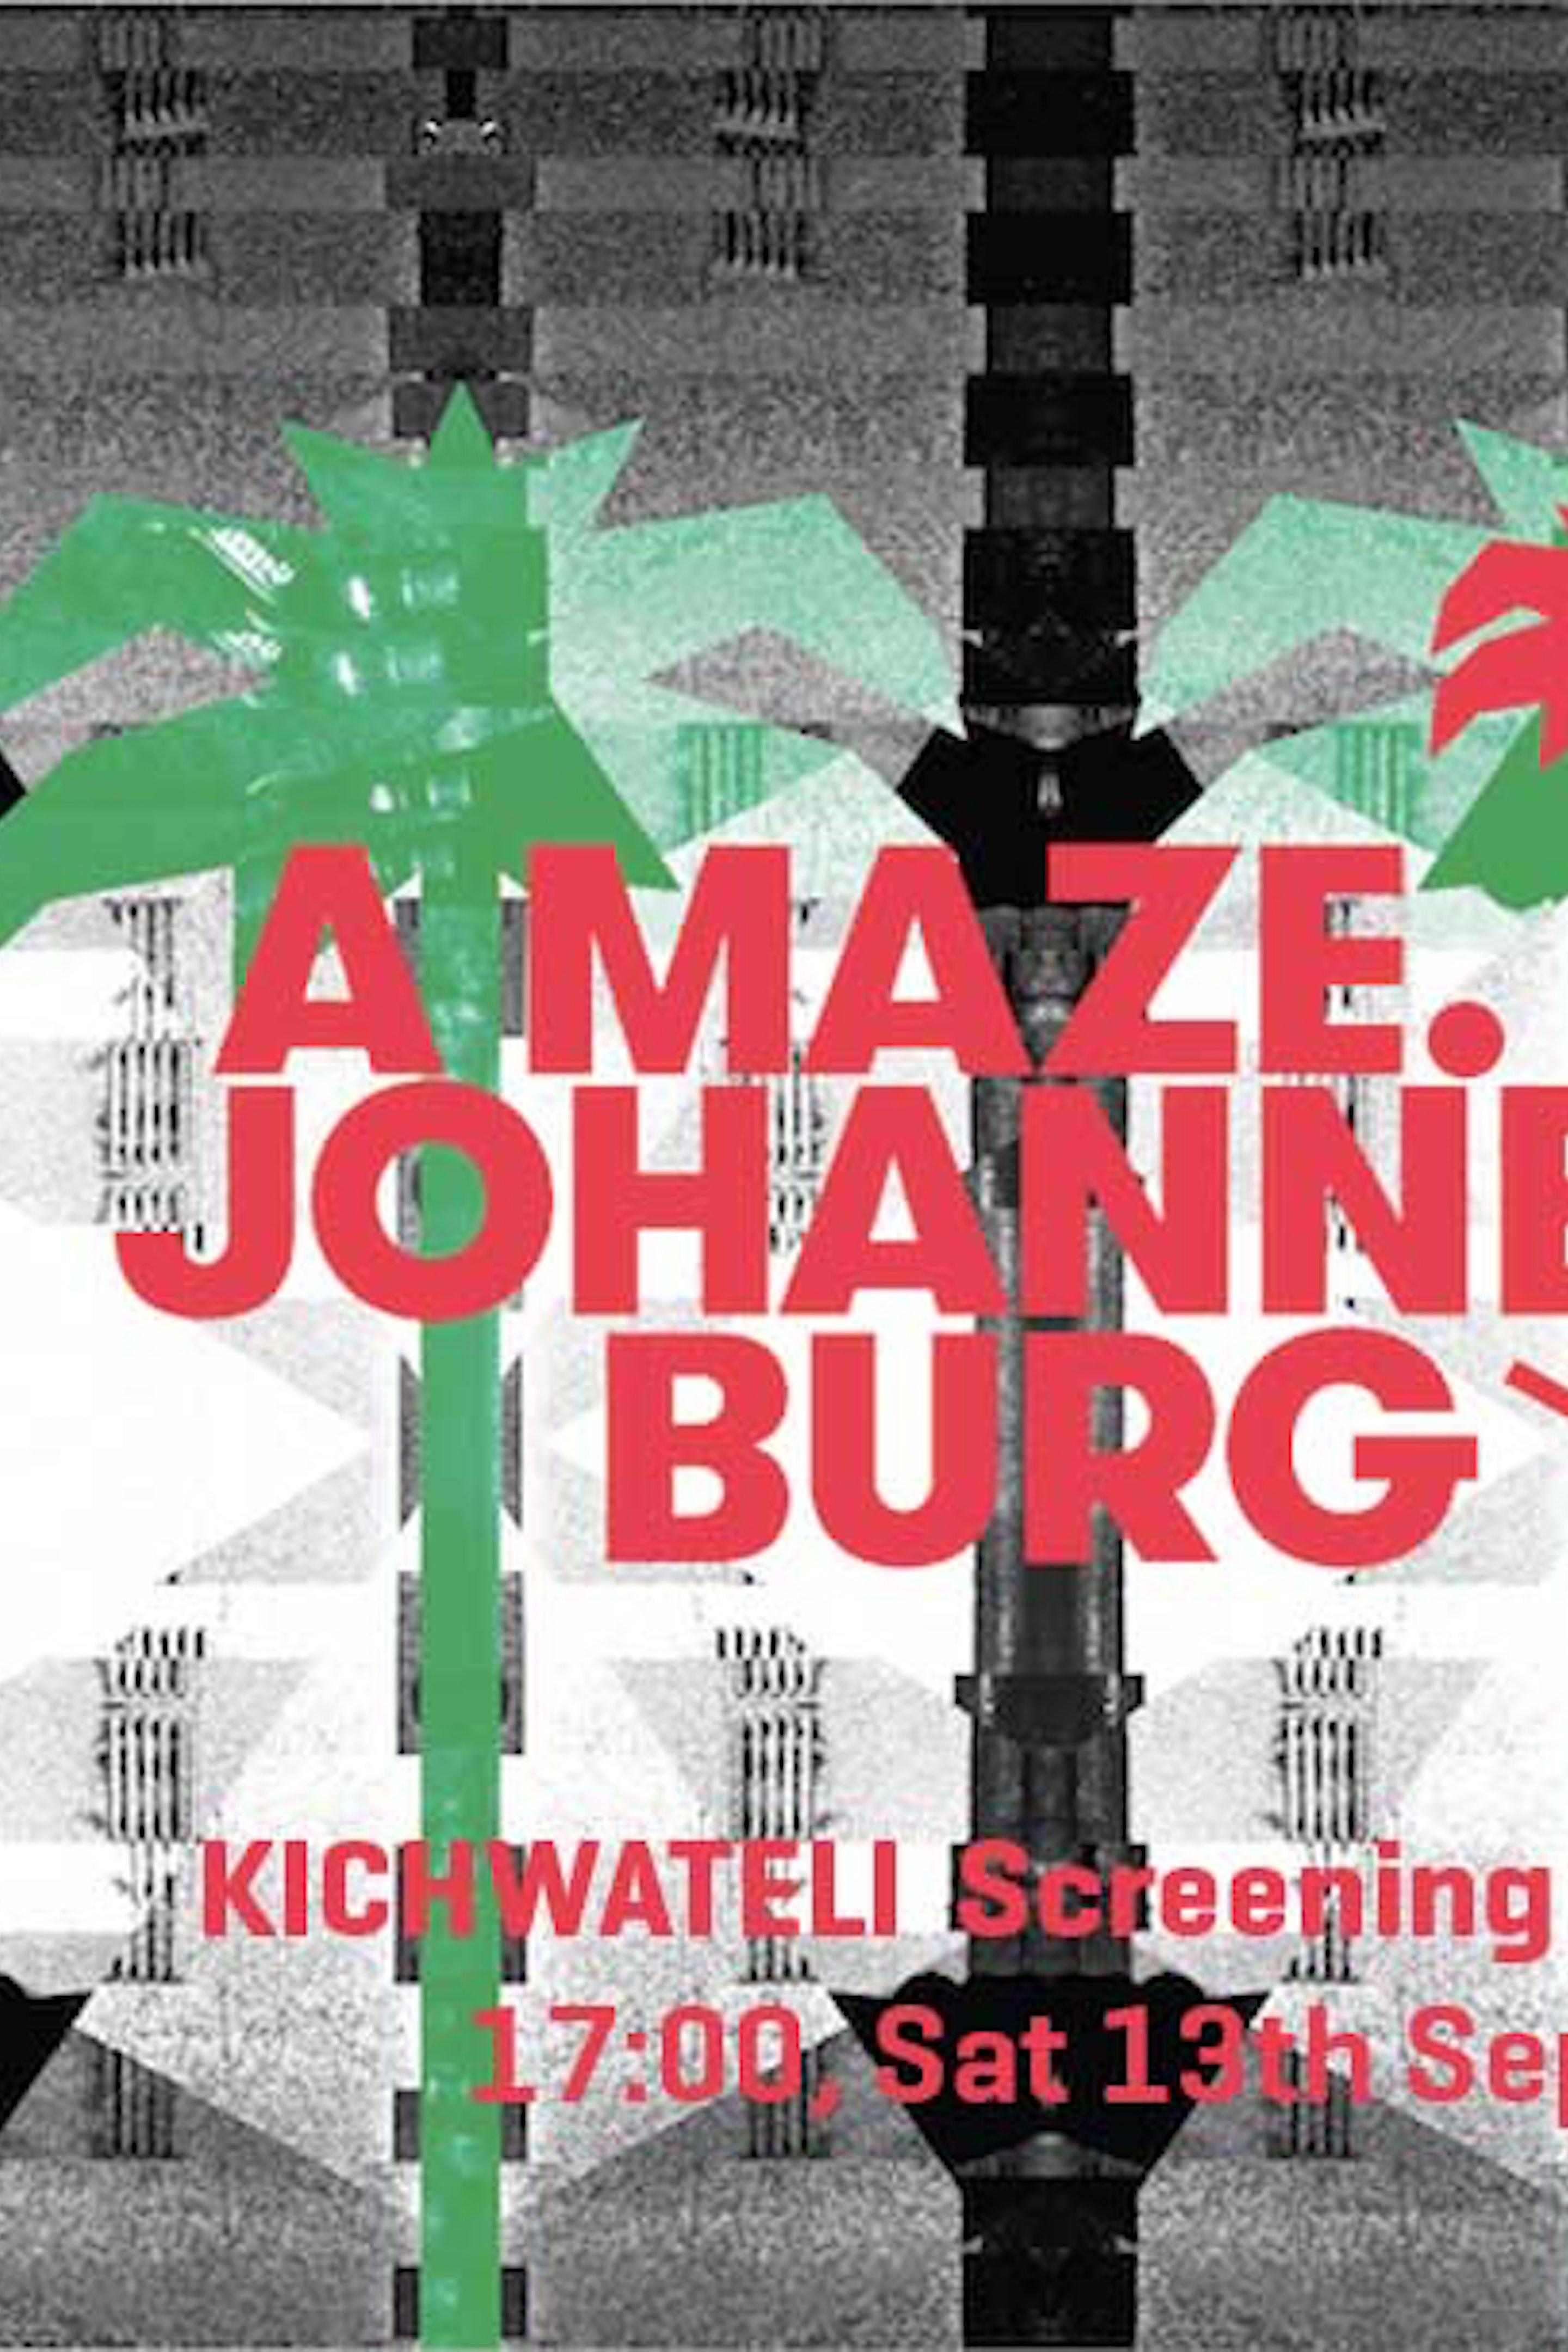 A MAZE.: Johannes-burg '14